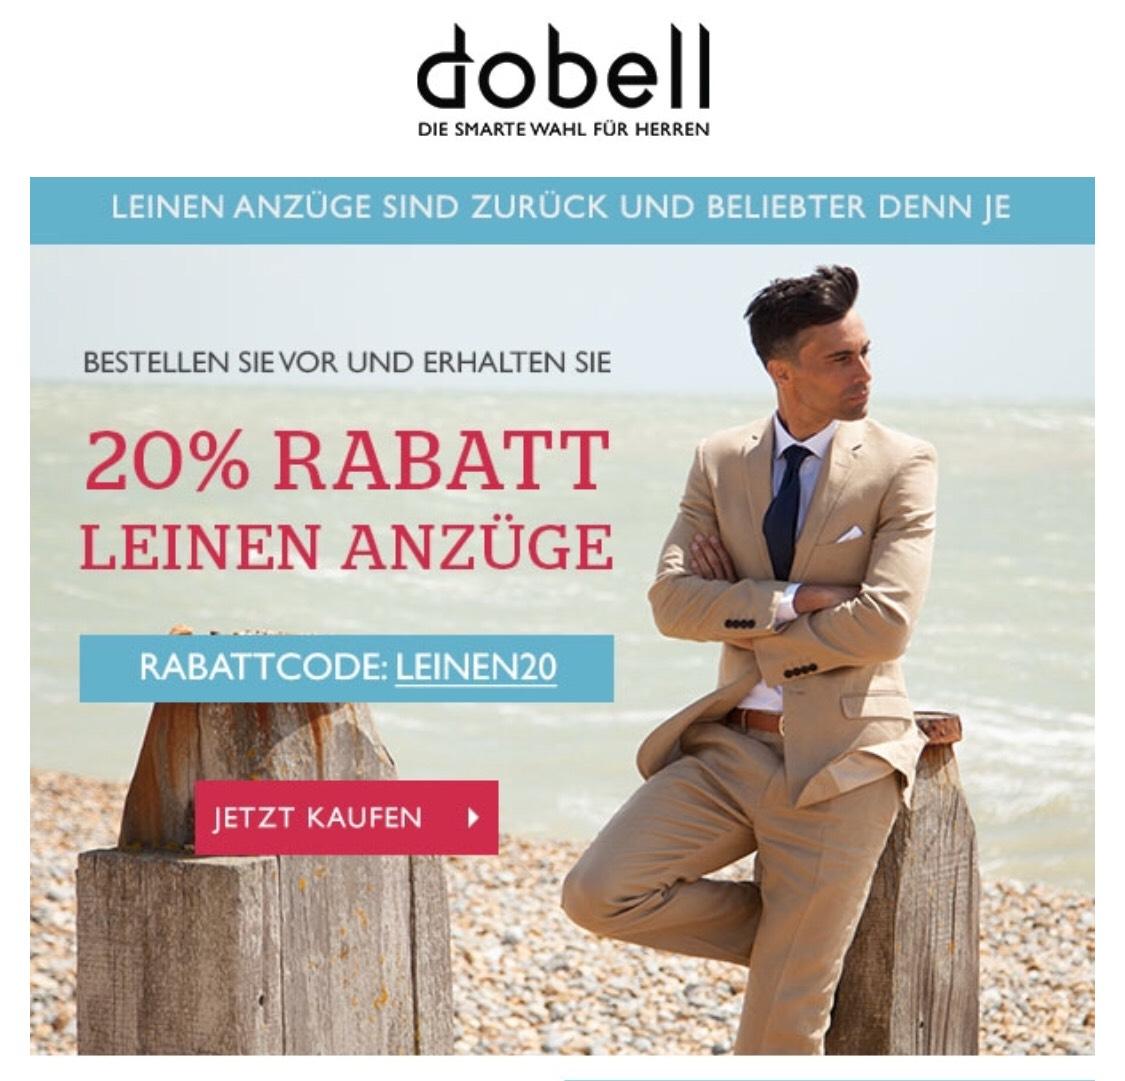 [Dobell.de] 20% auf Leinen-Anzüge